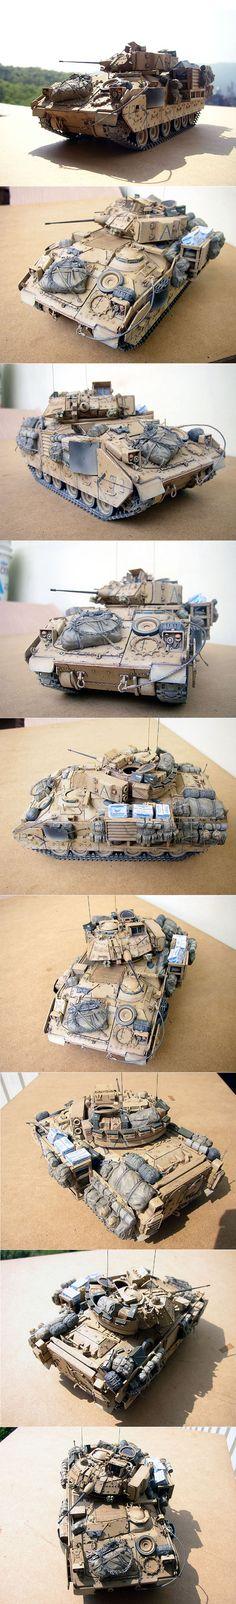 M2A2 1/35 Scale Model